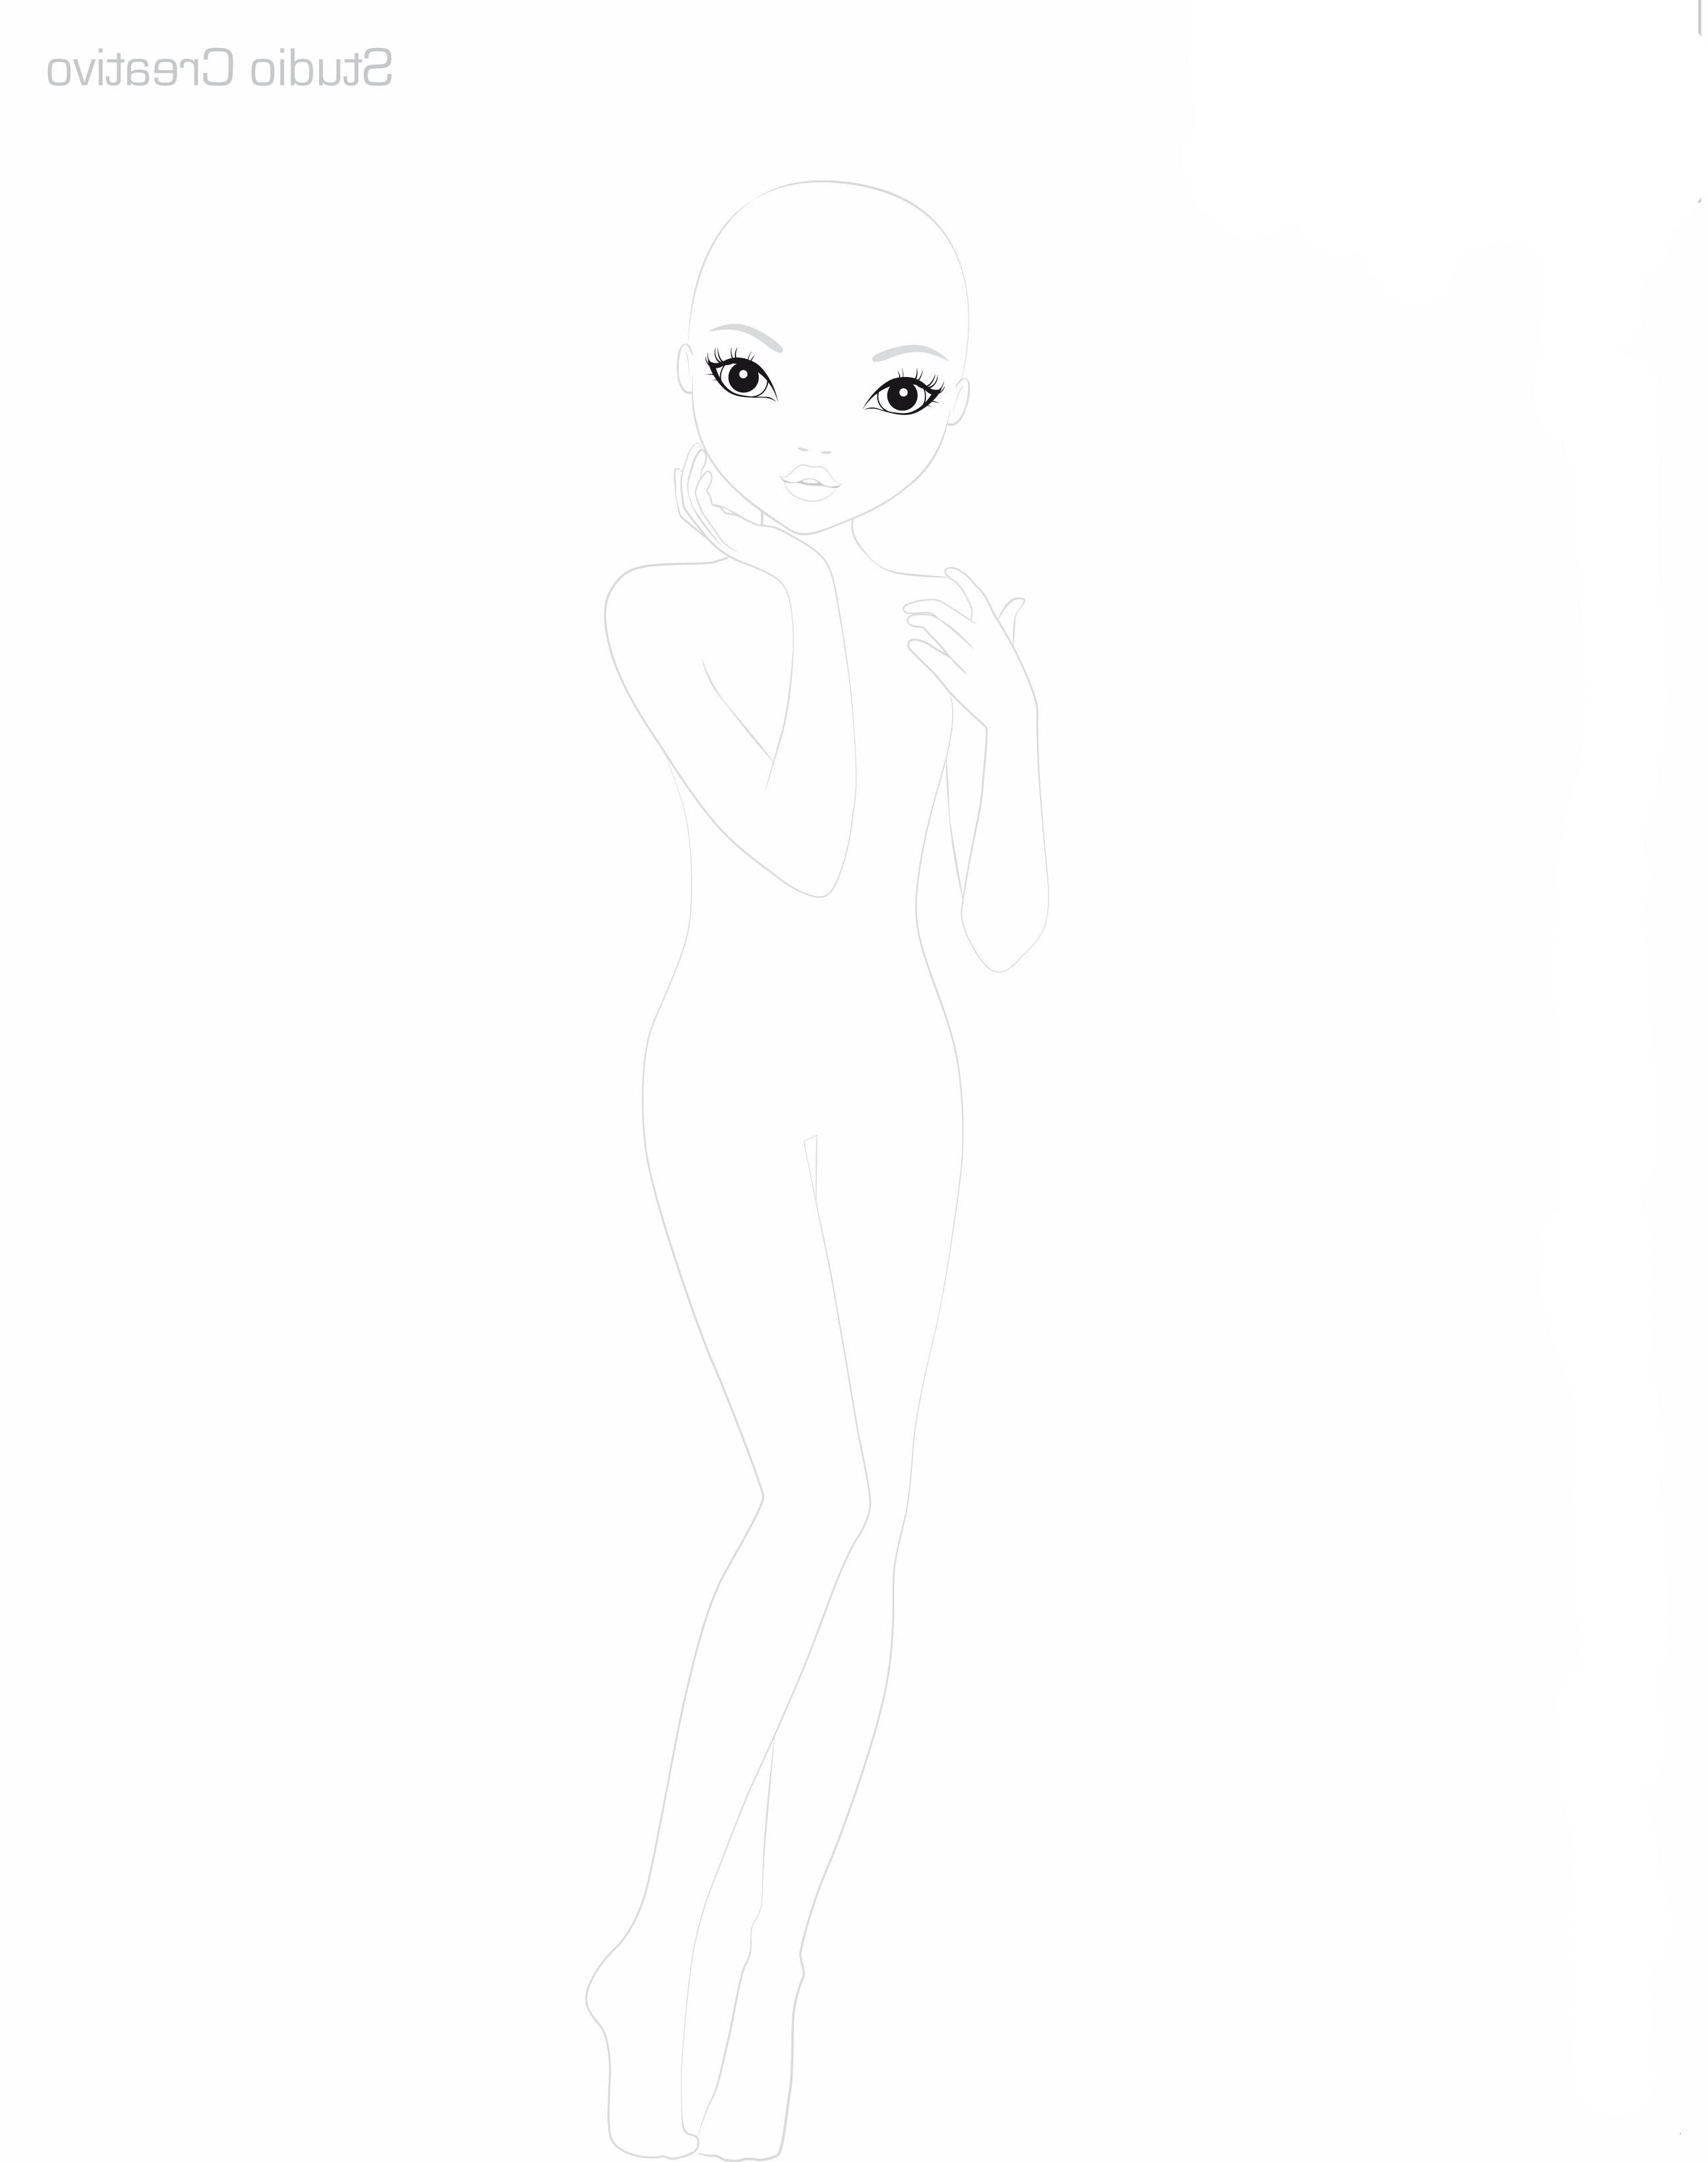 Ausmalbilder topmodel Meerjungfrau Frisch 25 Neu Ausmalbild topmodel – Malvorlagen Ideen Galerie